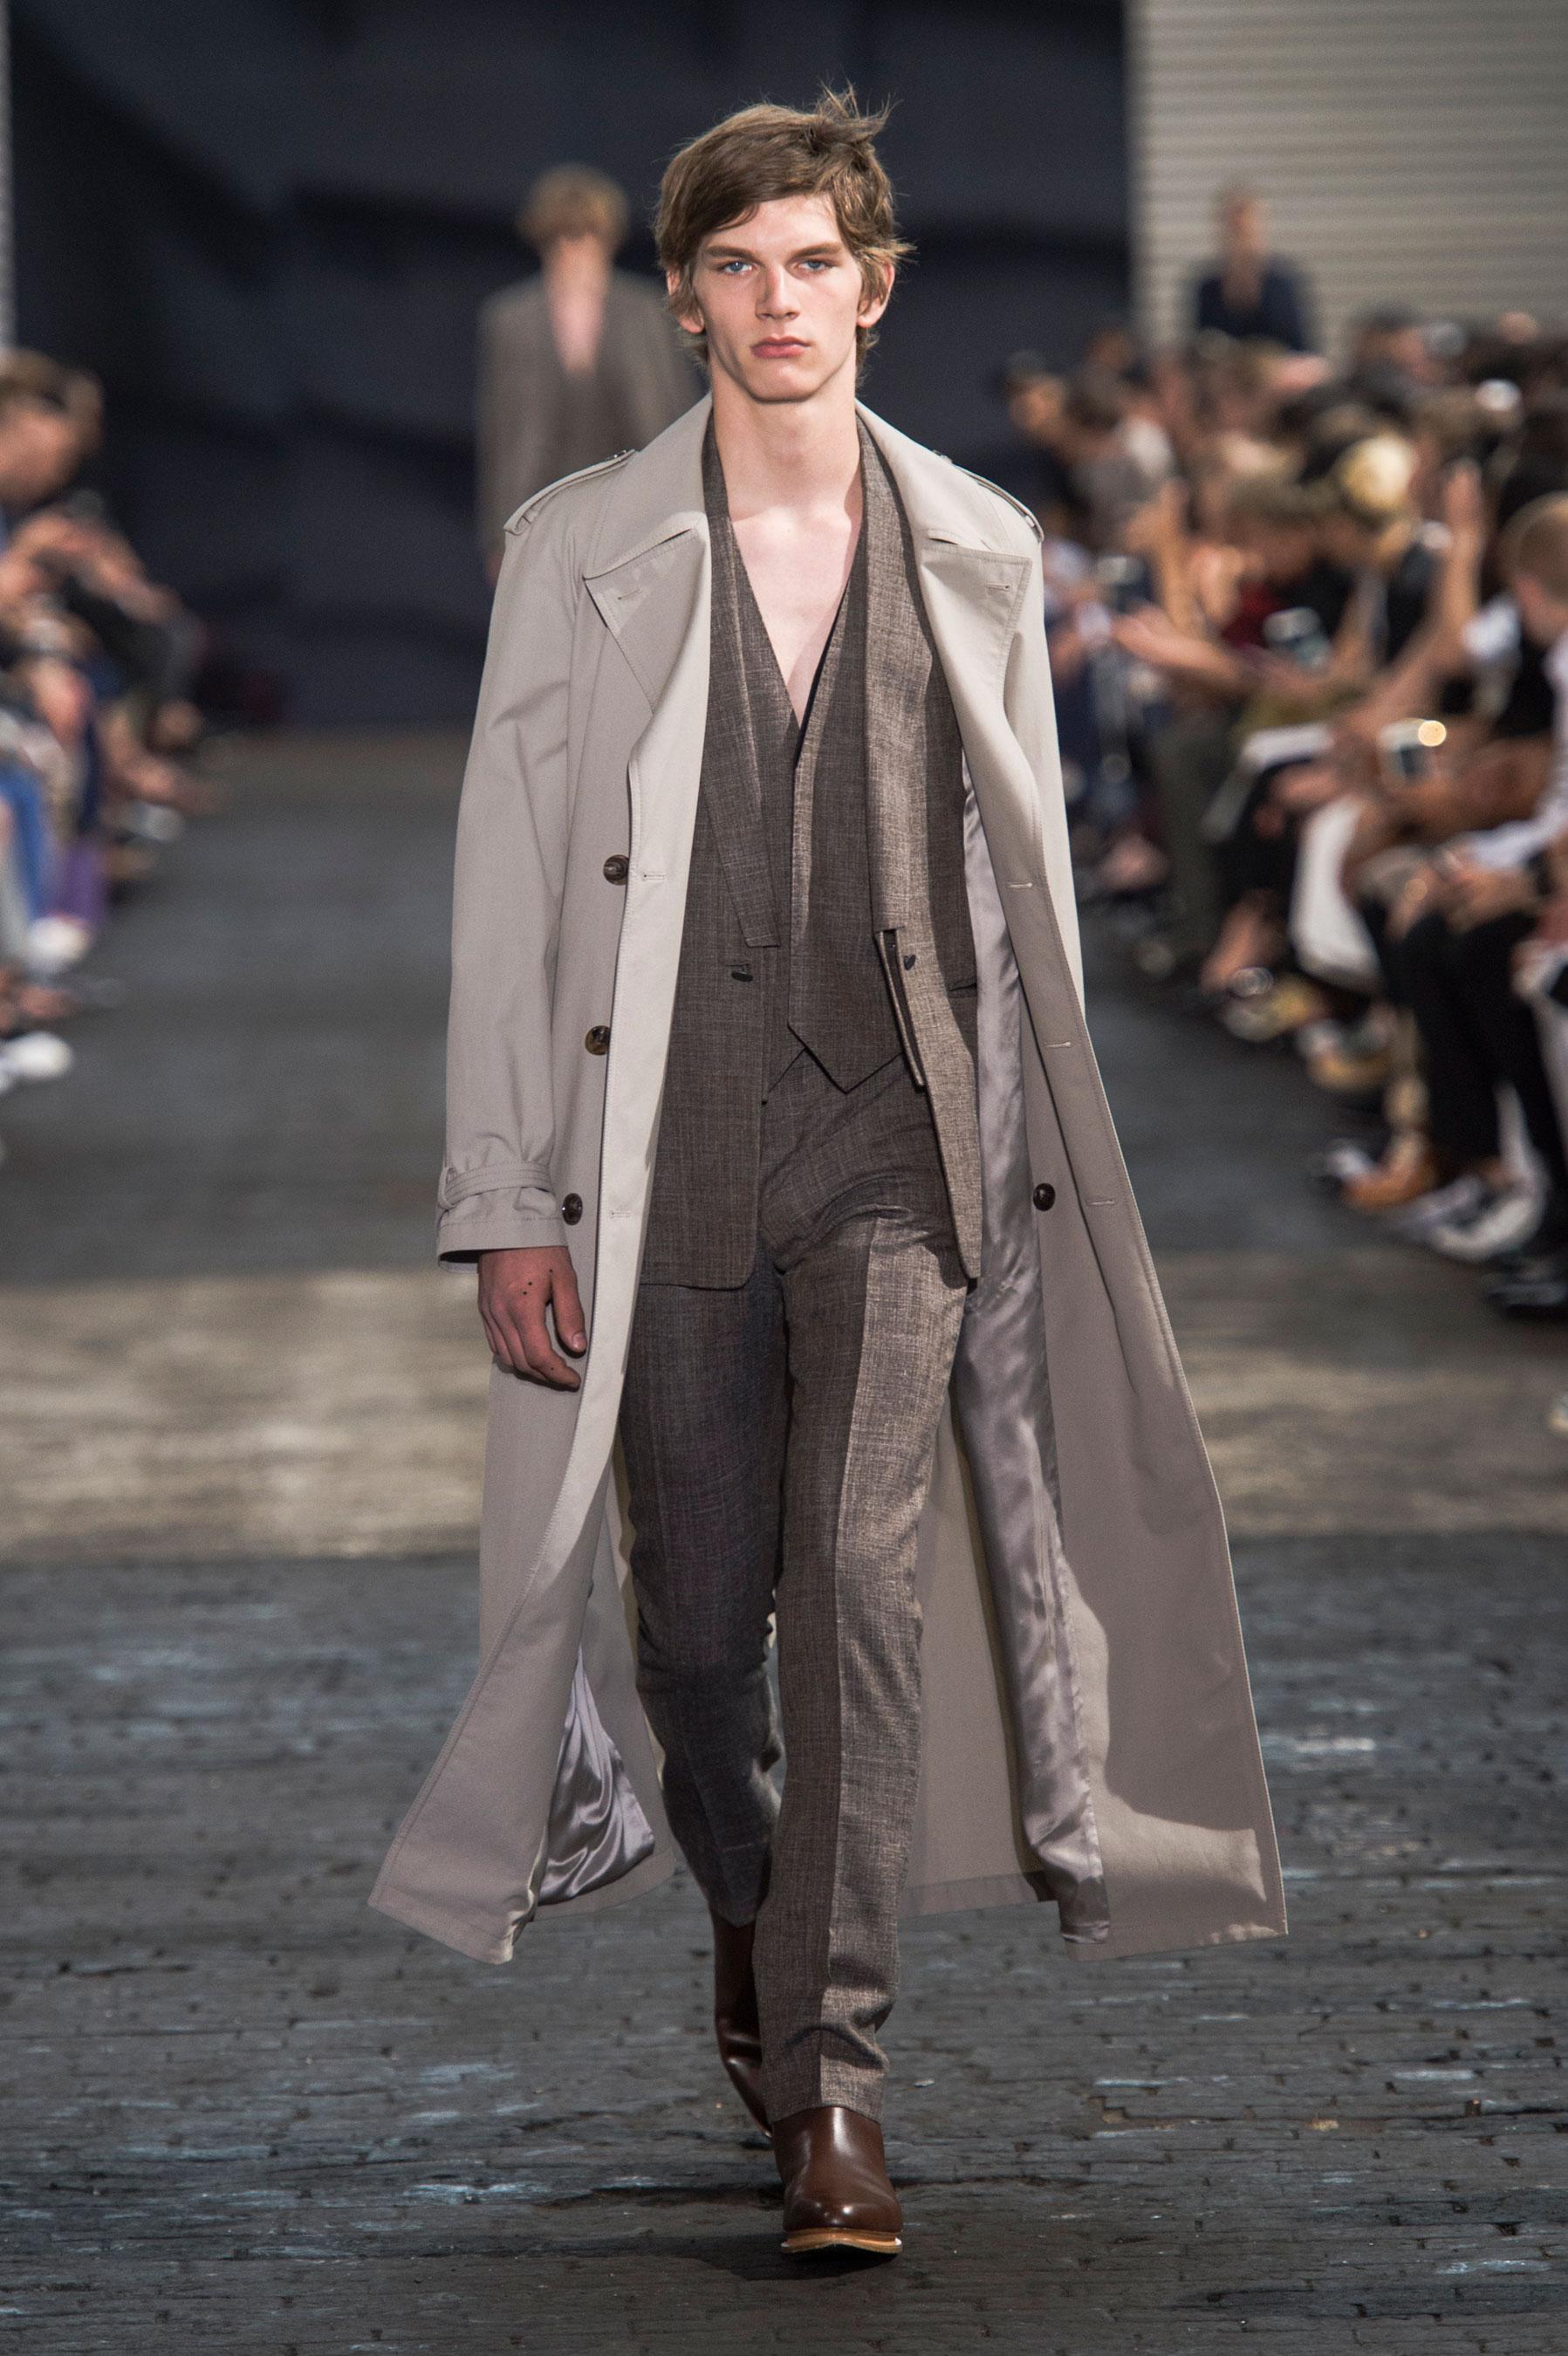 Maison Margiela Spring/Summer 2016 Menswear Collection | Paris Fashion Week